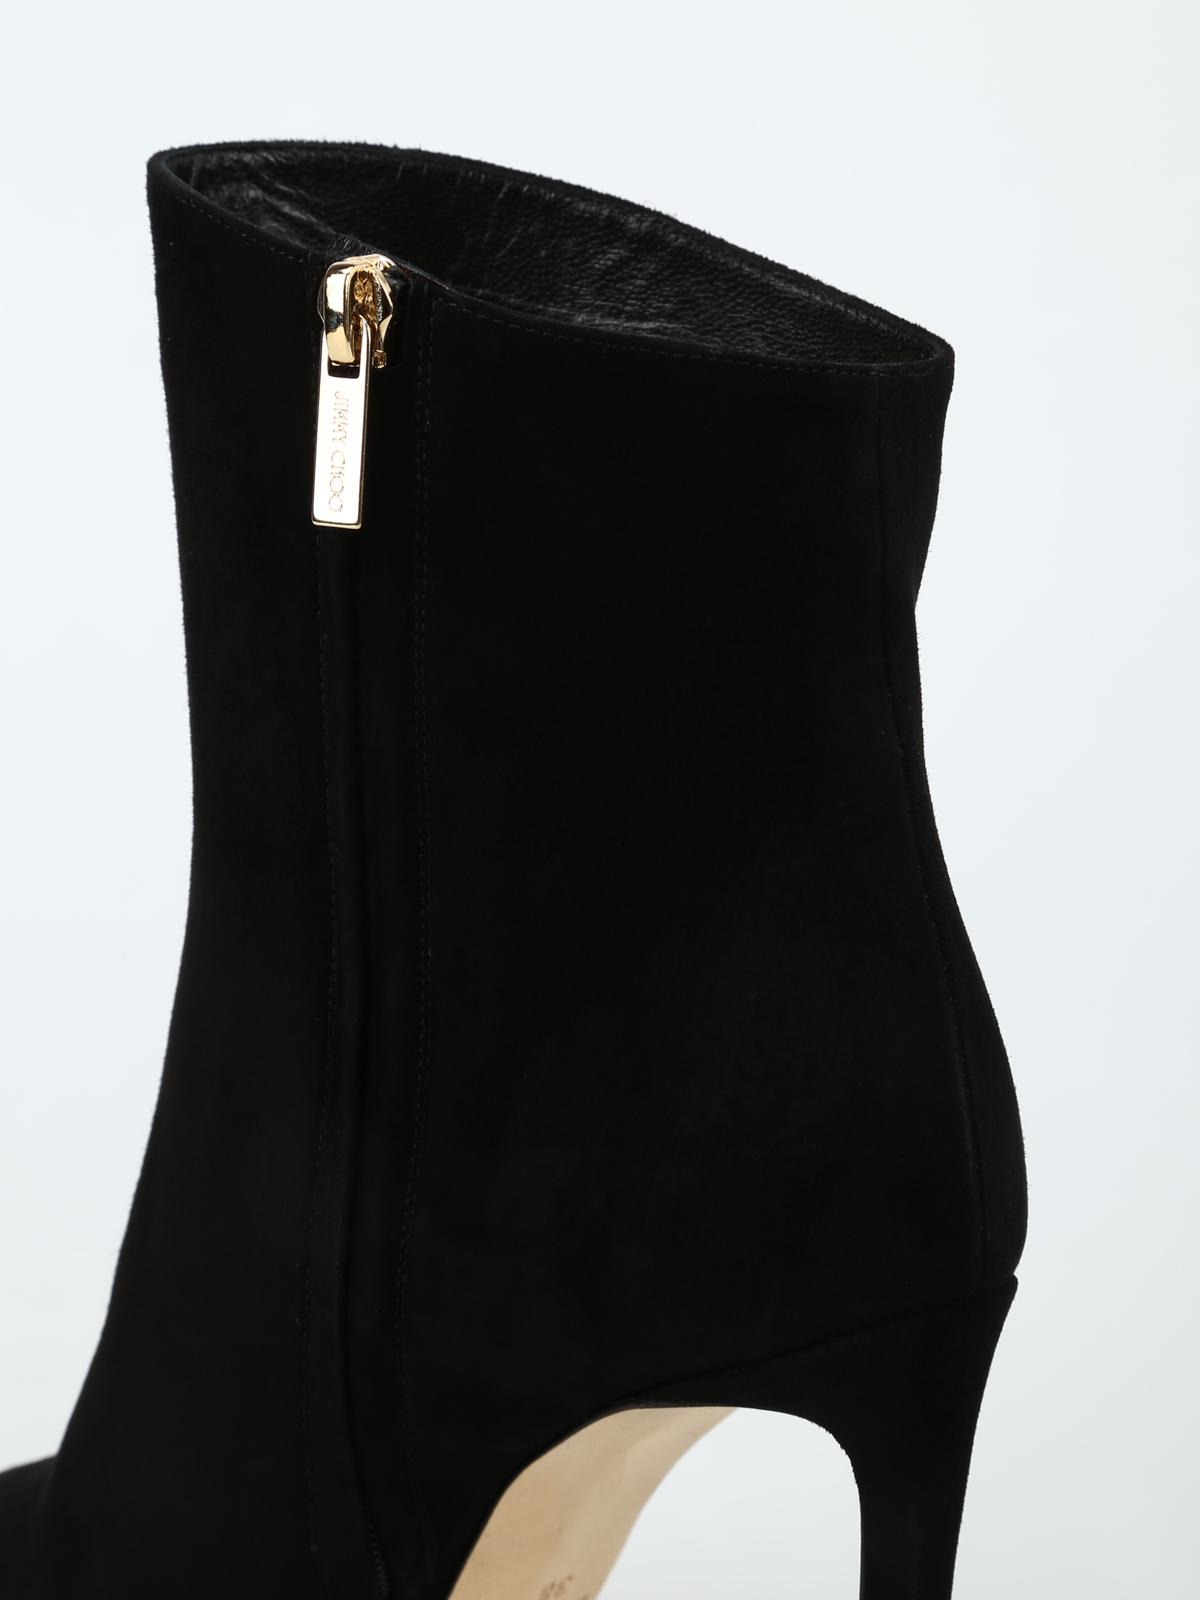 7422012e47a7 Jimmy Choo - Helaine 100 black suede heeled booties - ankle boots ...